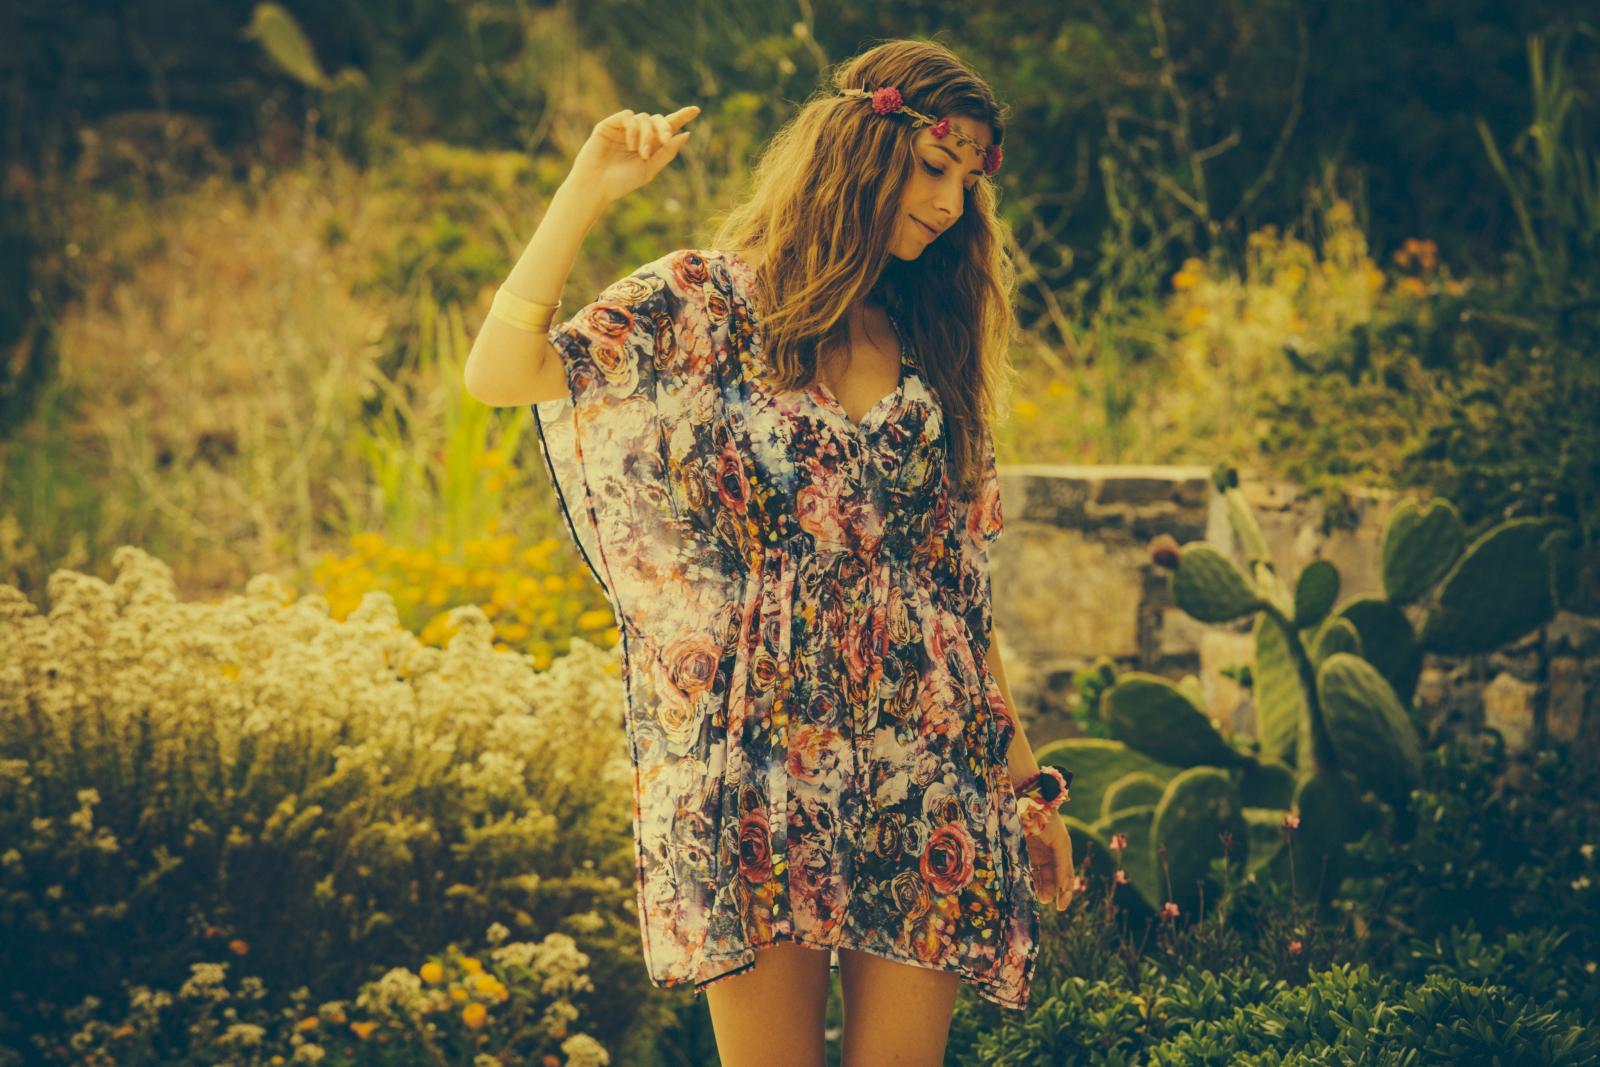 Heather in a Greek garden 60s vibe